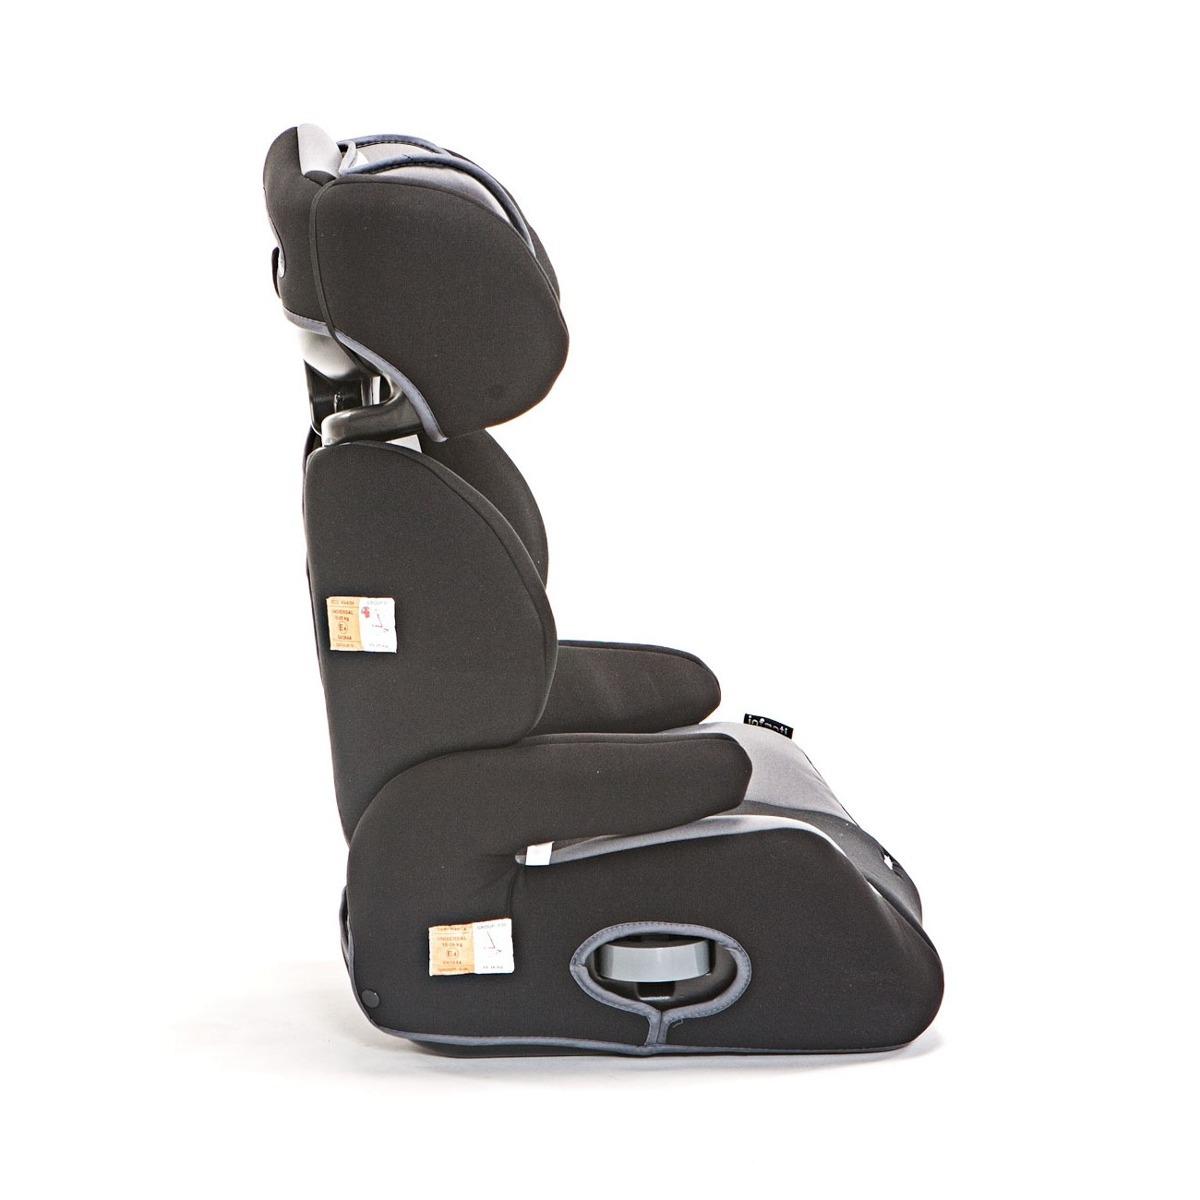 Silla para auto infanti n101 respaldo desmontable 15 36 kg for Silla de auto infanti